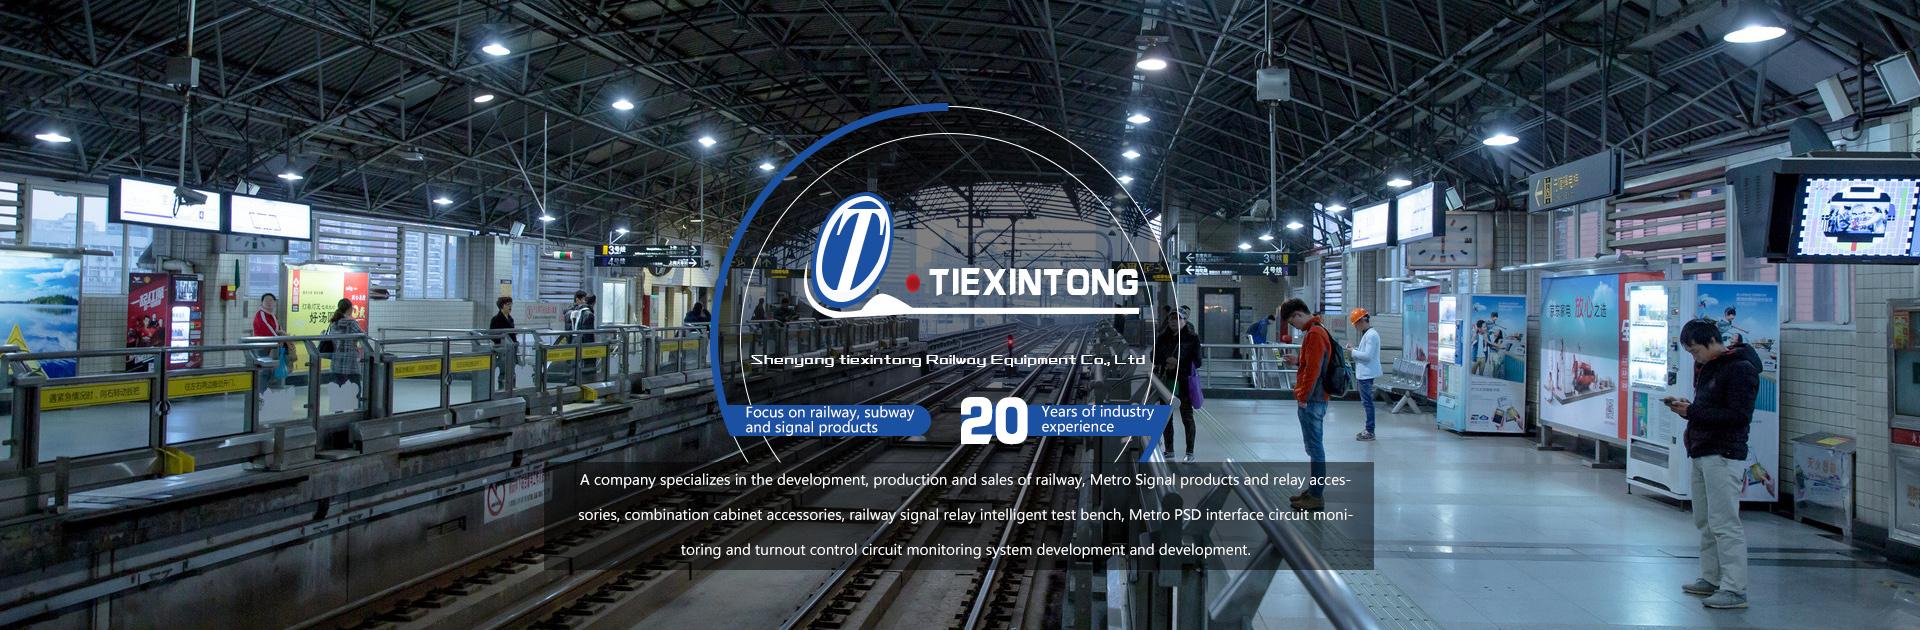 Shenyang tiexintong Railway Equipment Co., Ltd